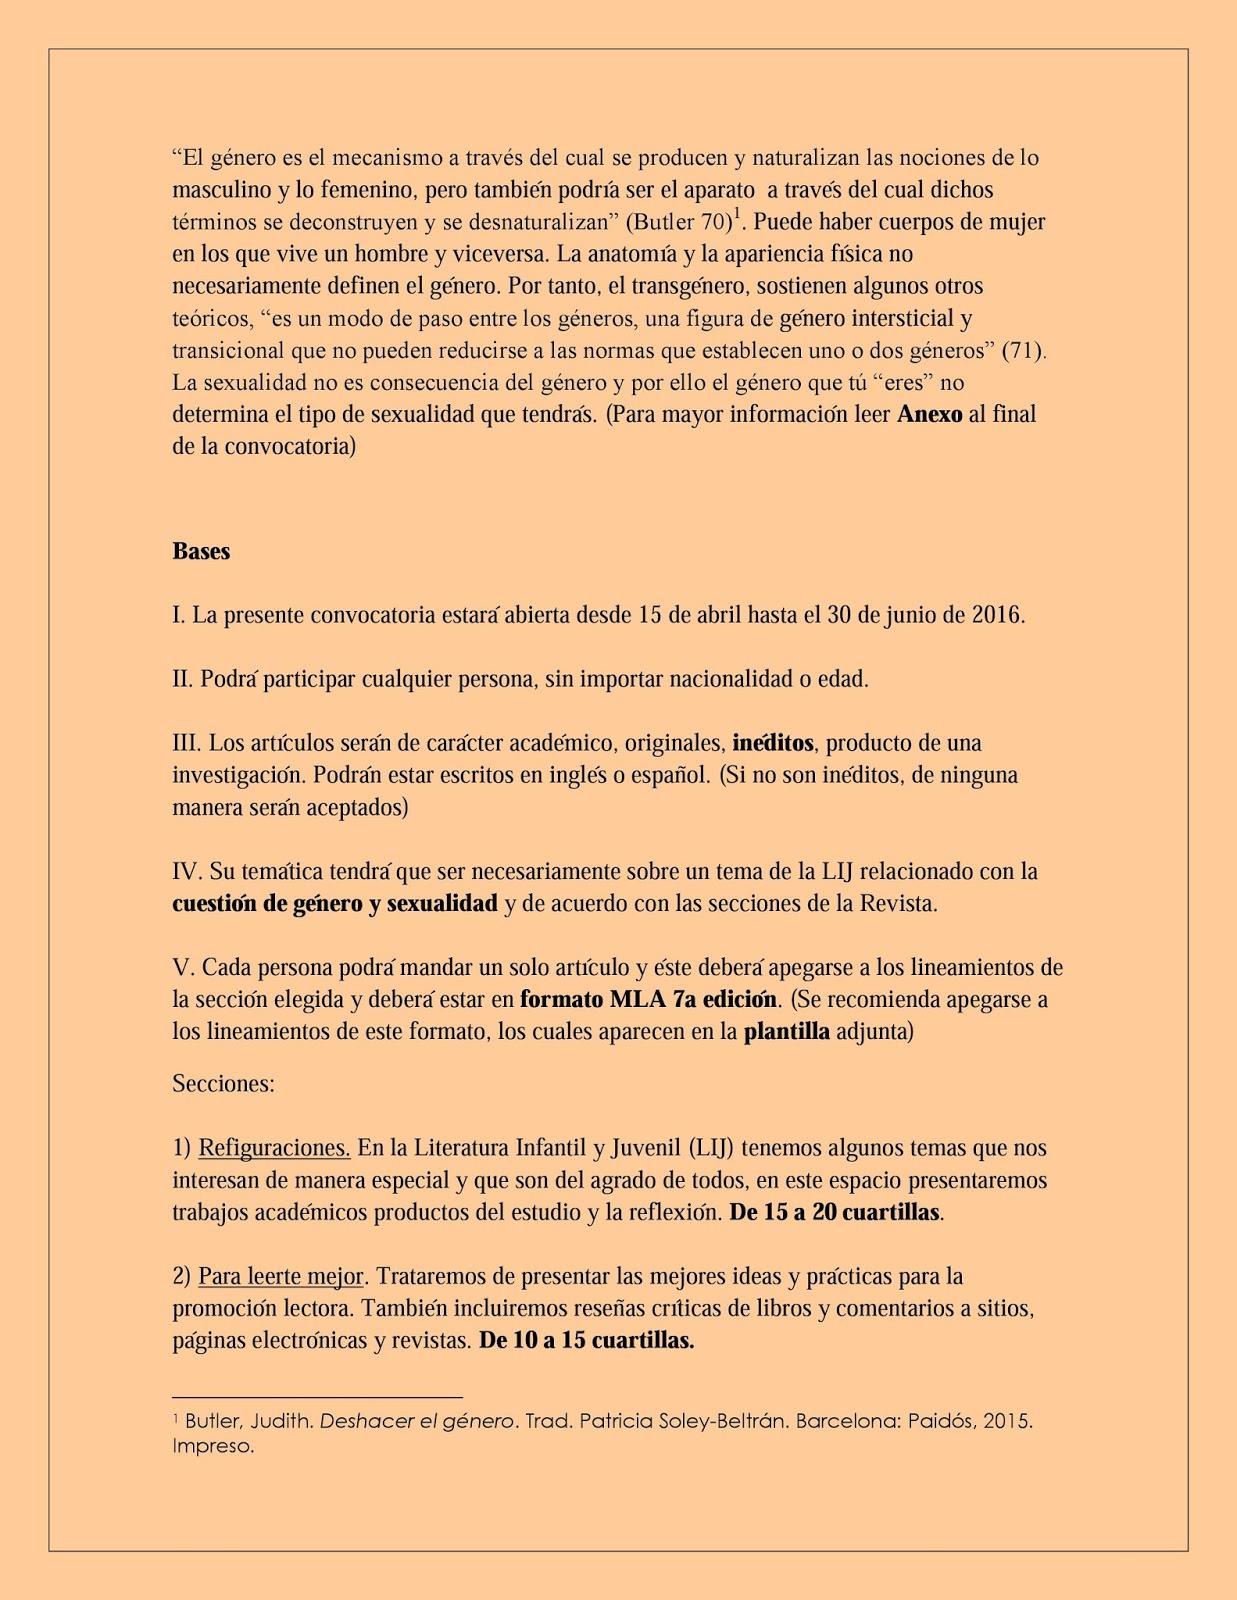 círculo de traductores: Convocatoria: Revista LIJ Ibero